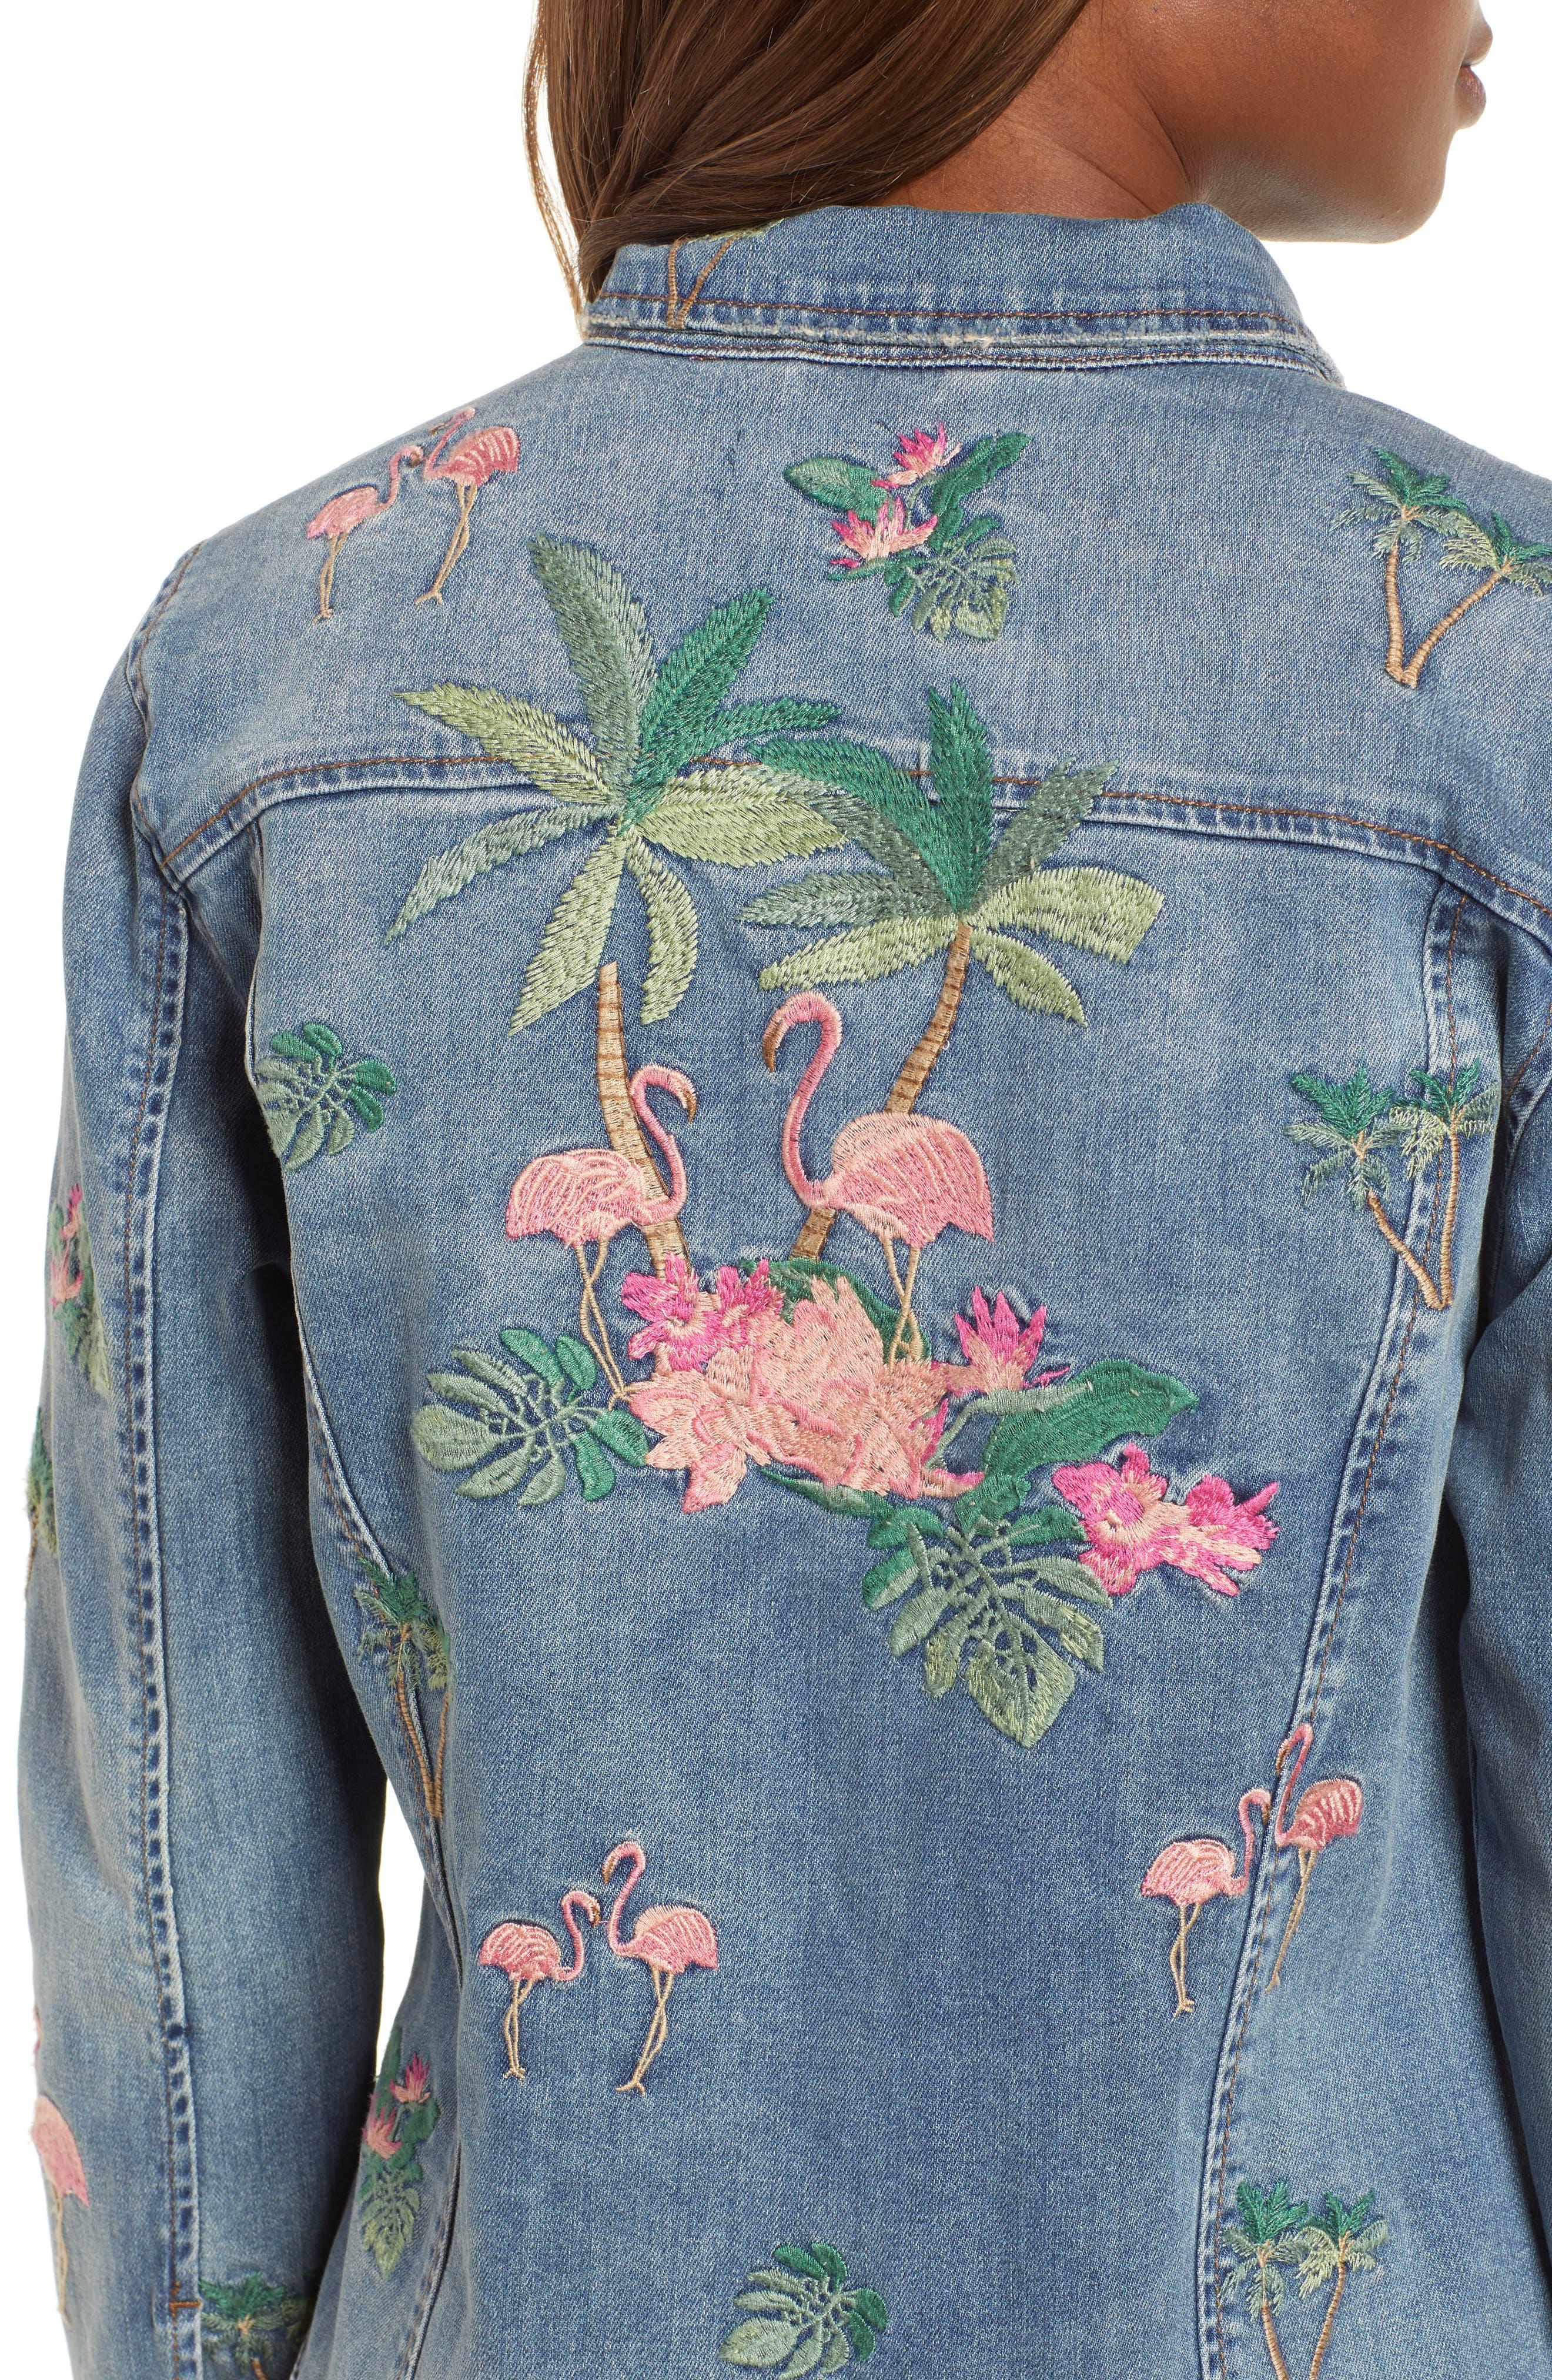 Flamingo Embroidered Denim Jacket,                             Alternate thumbnail 4, color,                             Blue W/ Embroider